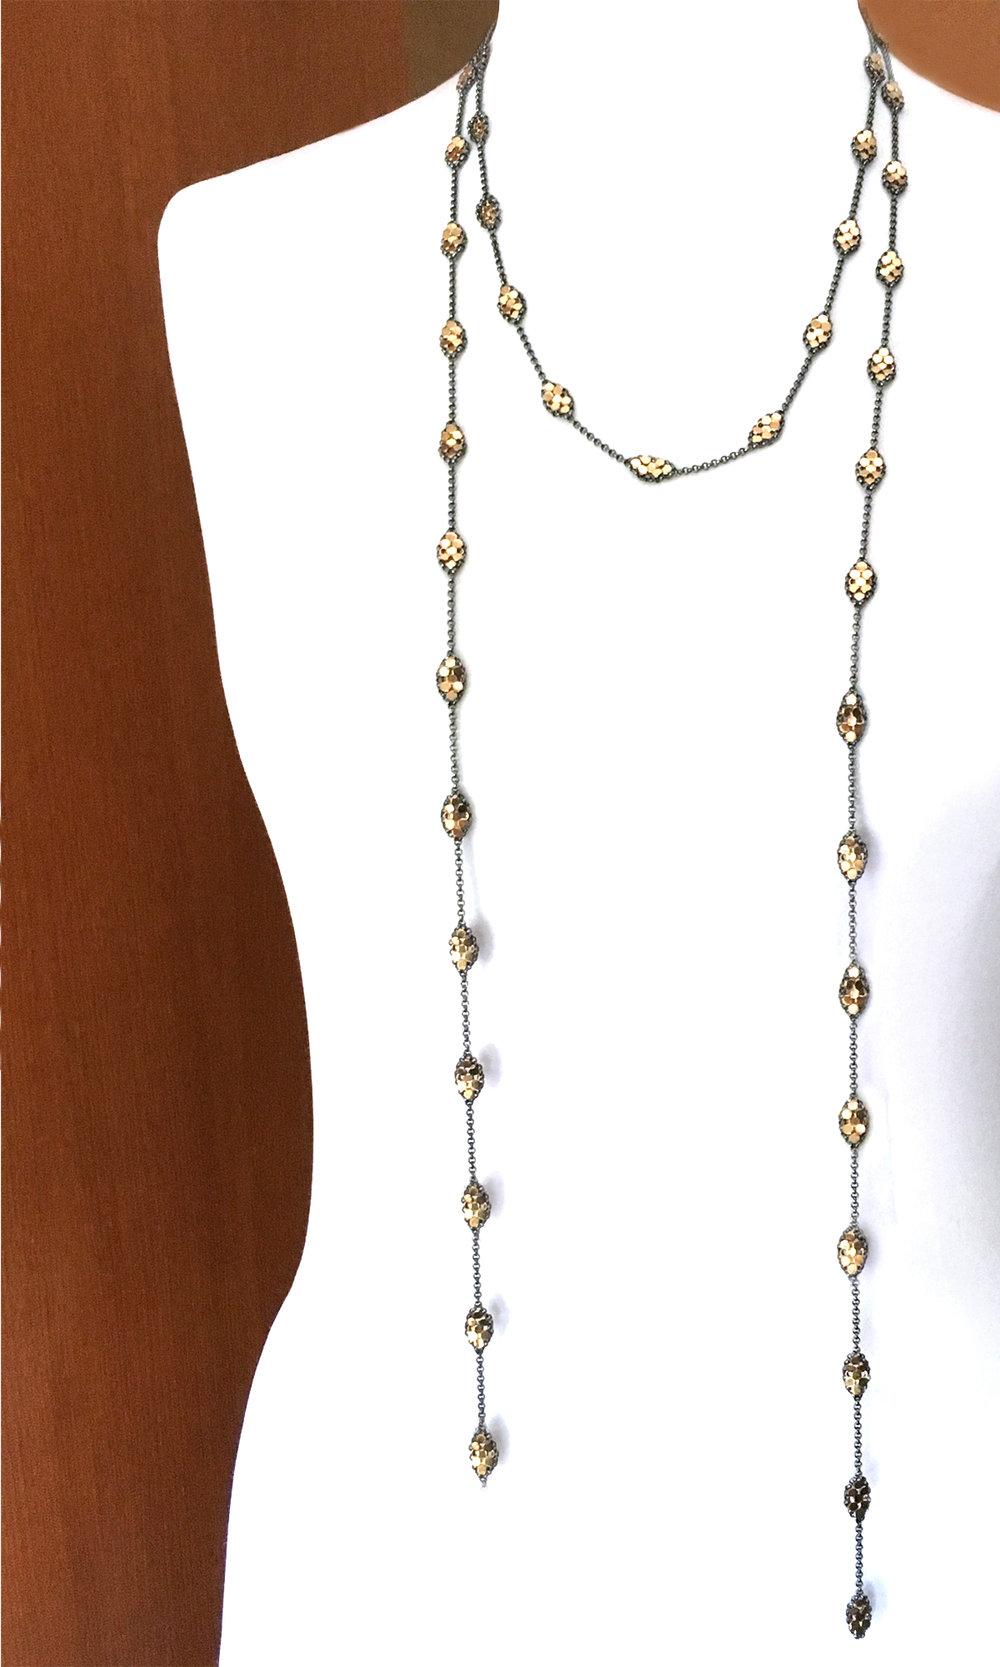 long-mesh-droplet-scarf-maralrapp.jpg